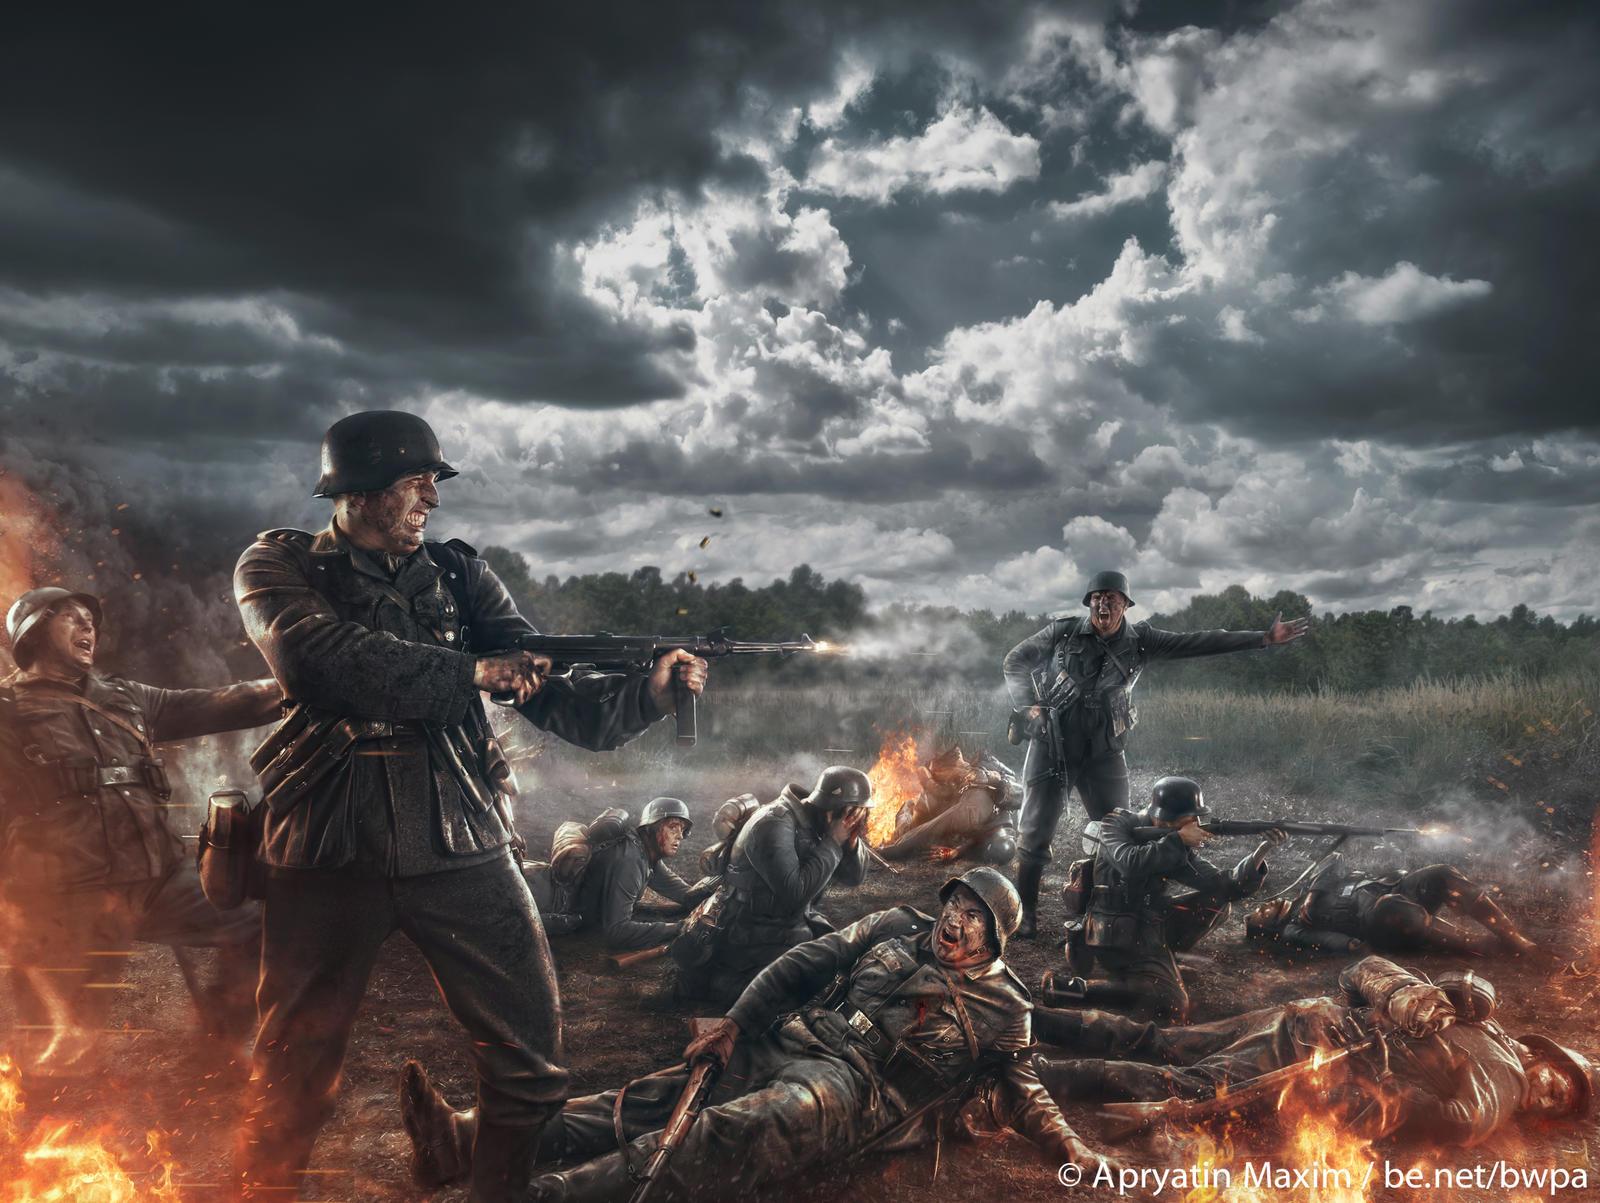 ww2 german army wallpaper - photo #11